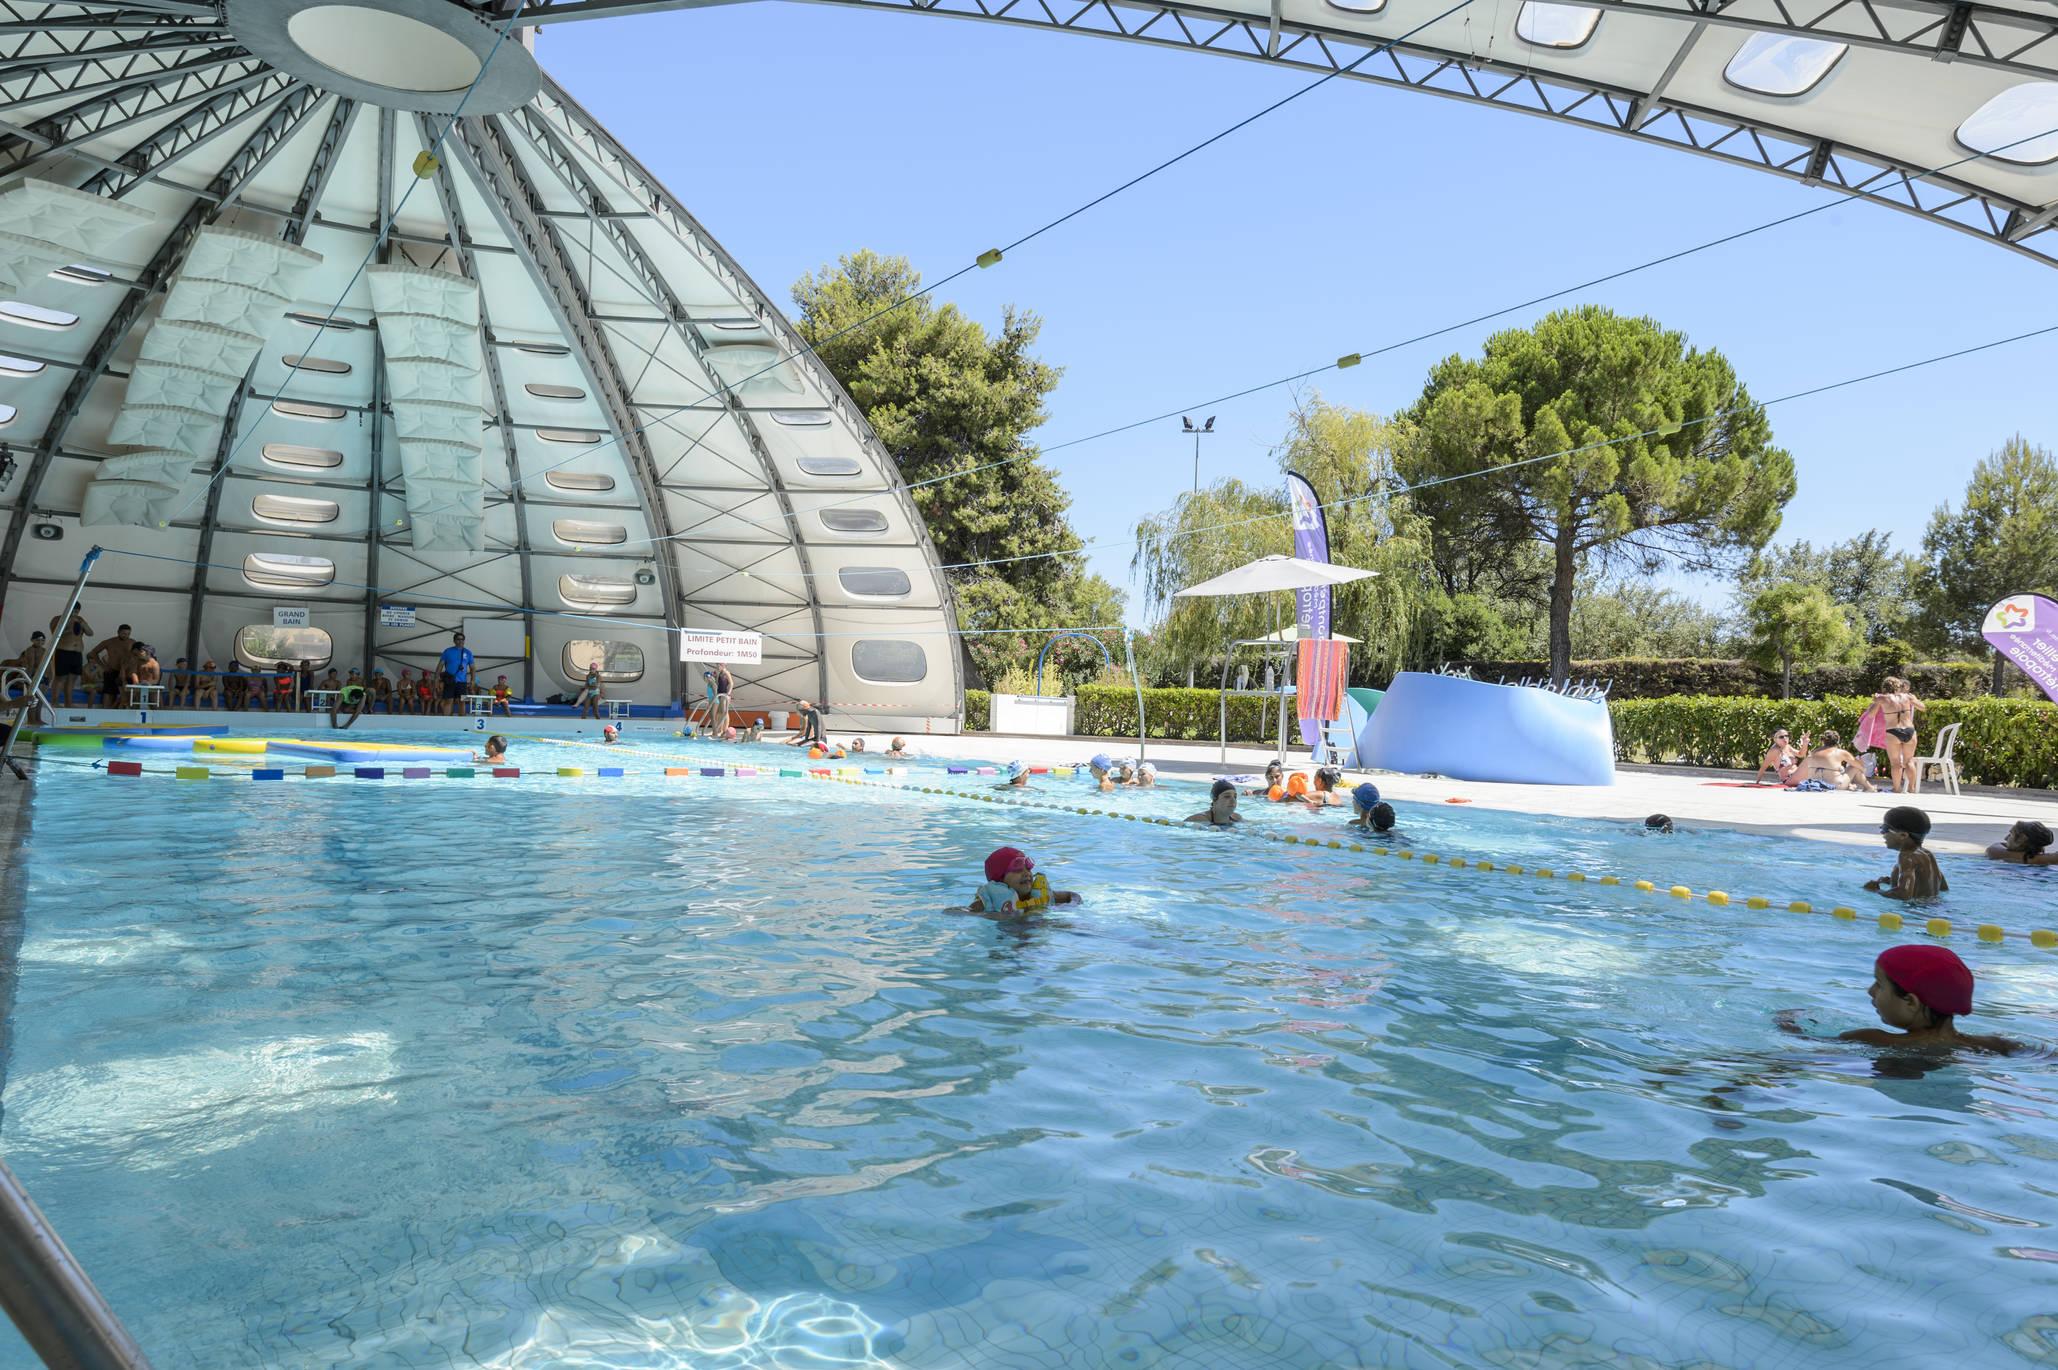 Piscine Jean Vives (Maurin), Swimming-Pool - Montpellier ... concernant Piscine Originale